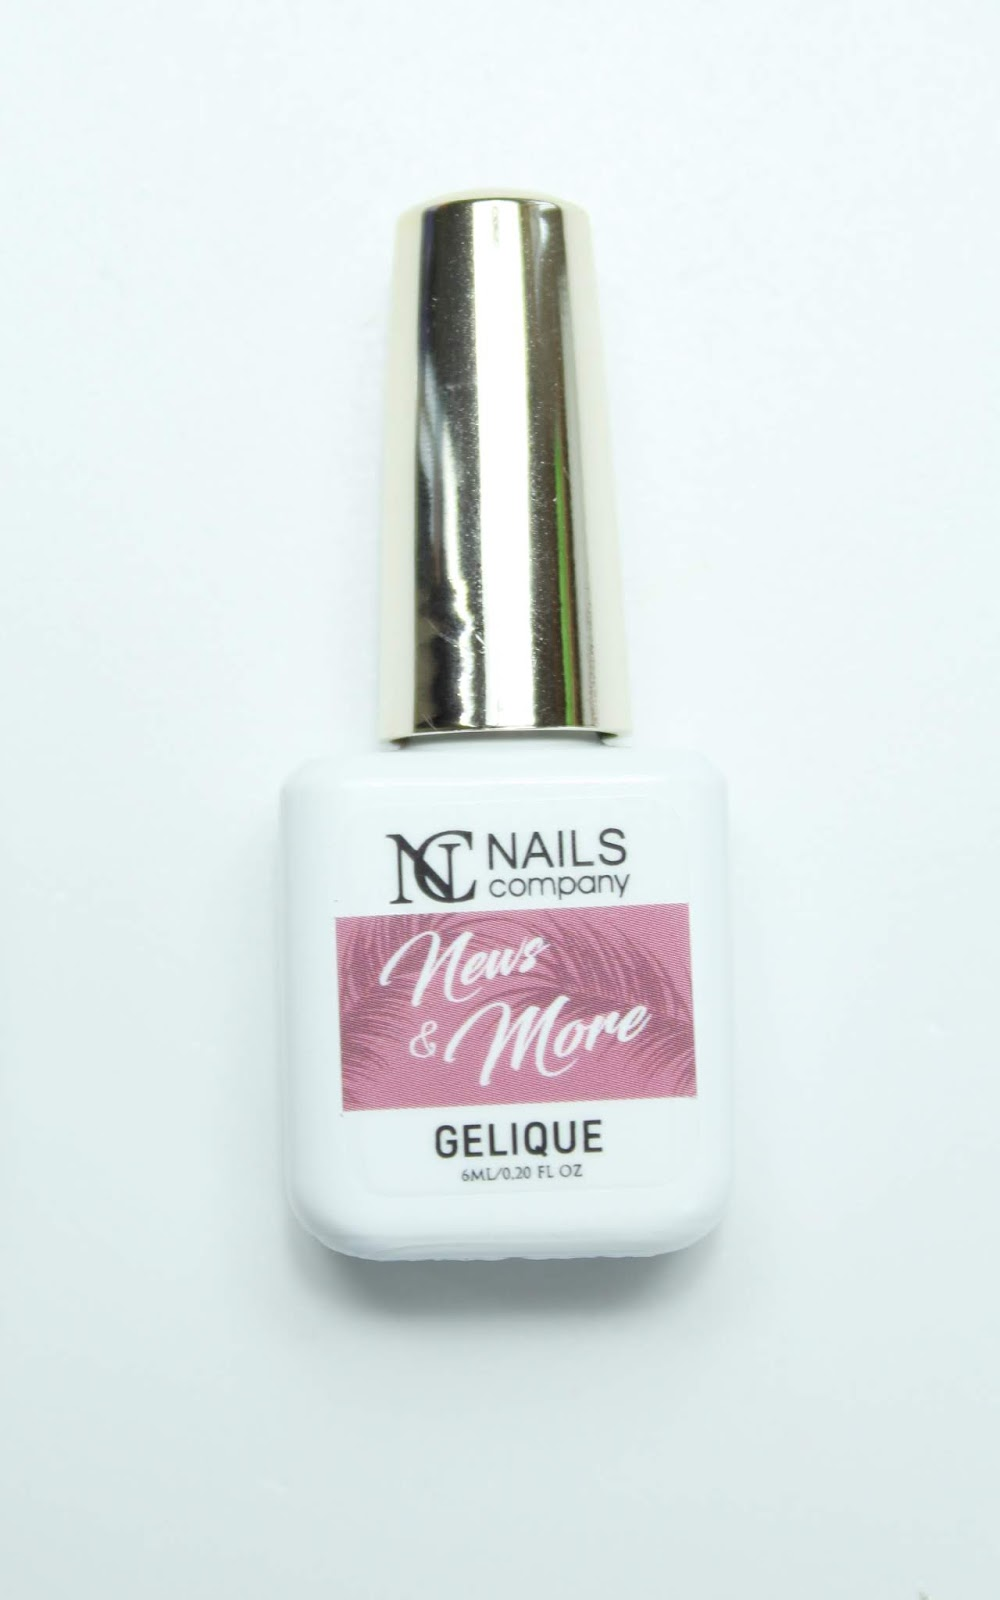 NC Nails Company News&More